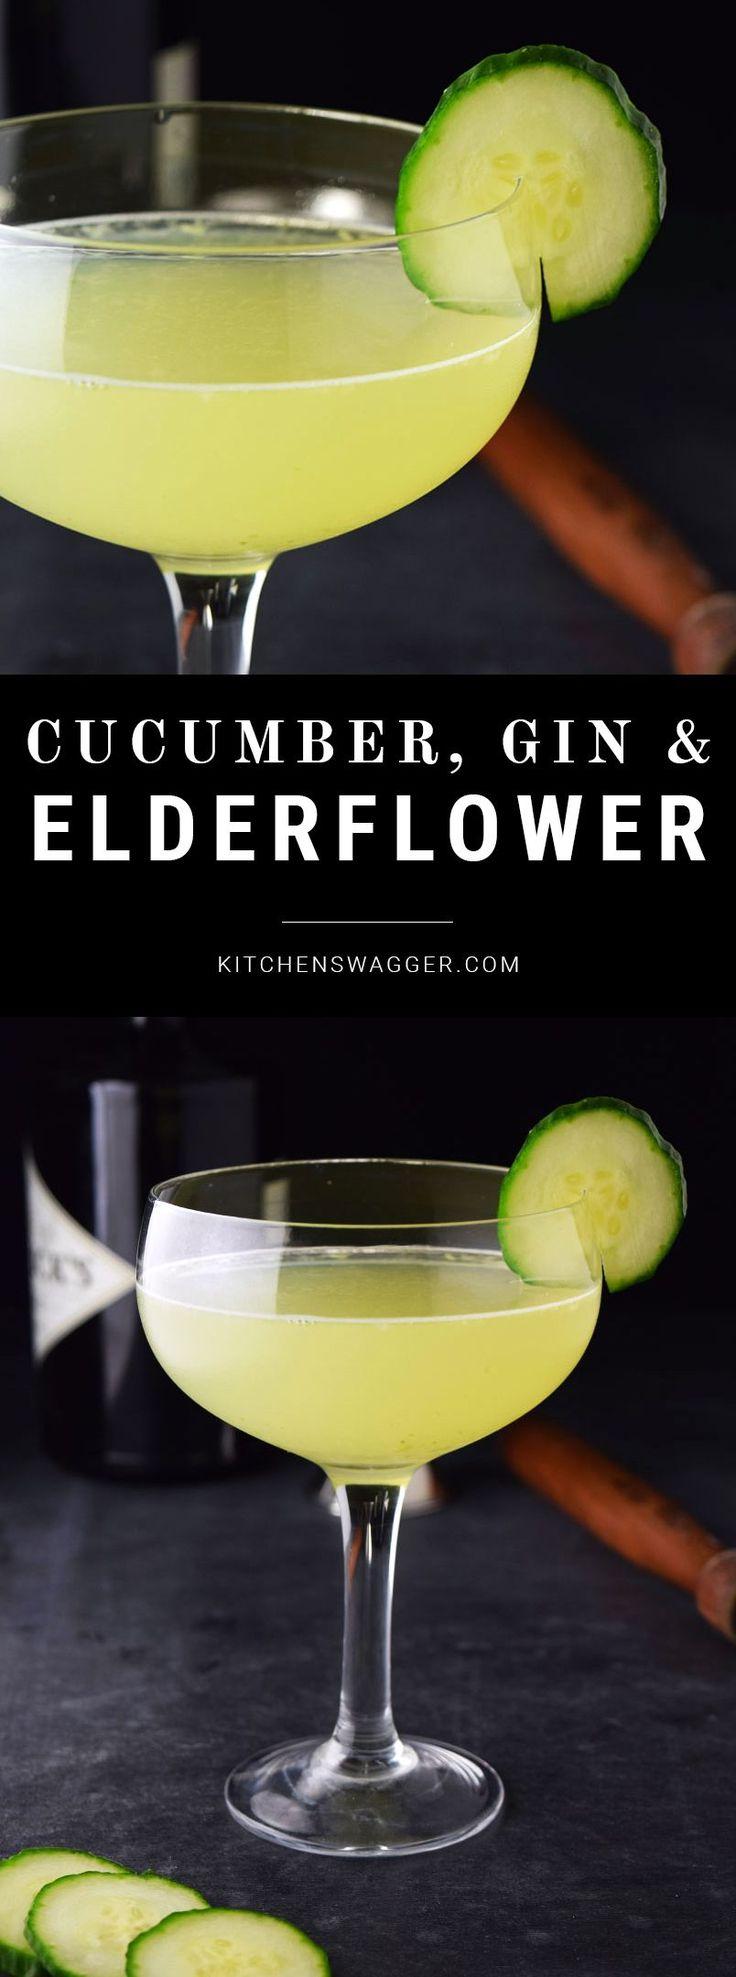 Cucumber Gin and Elderflower Martini